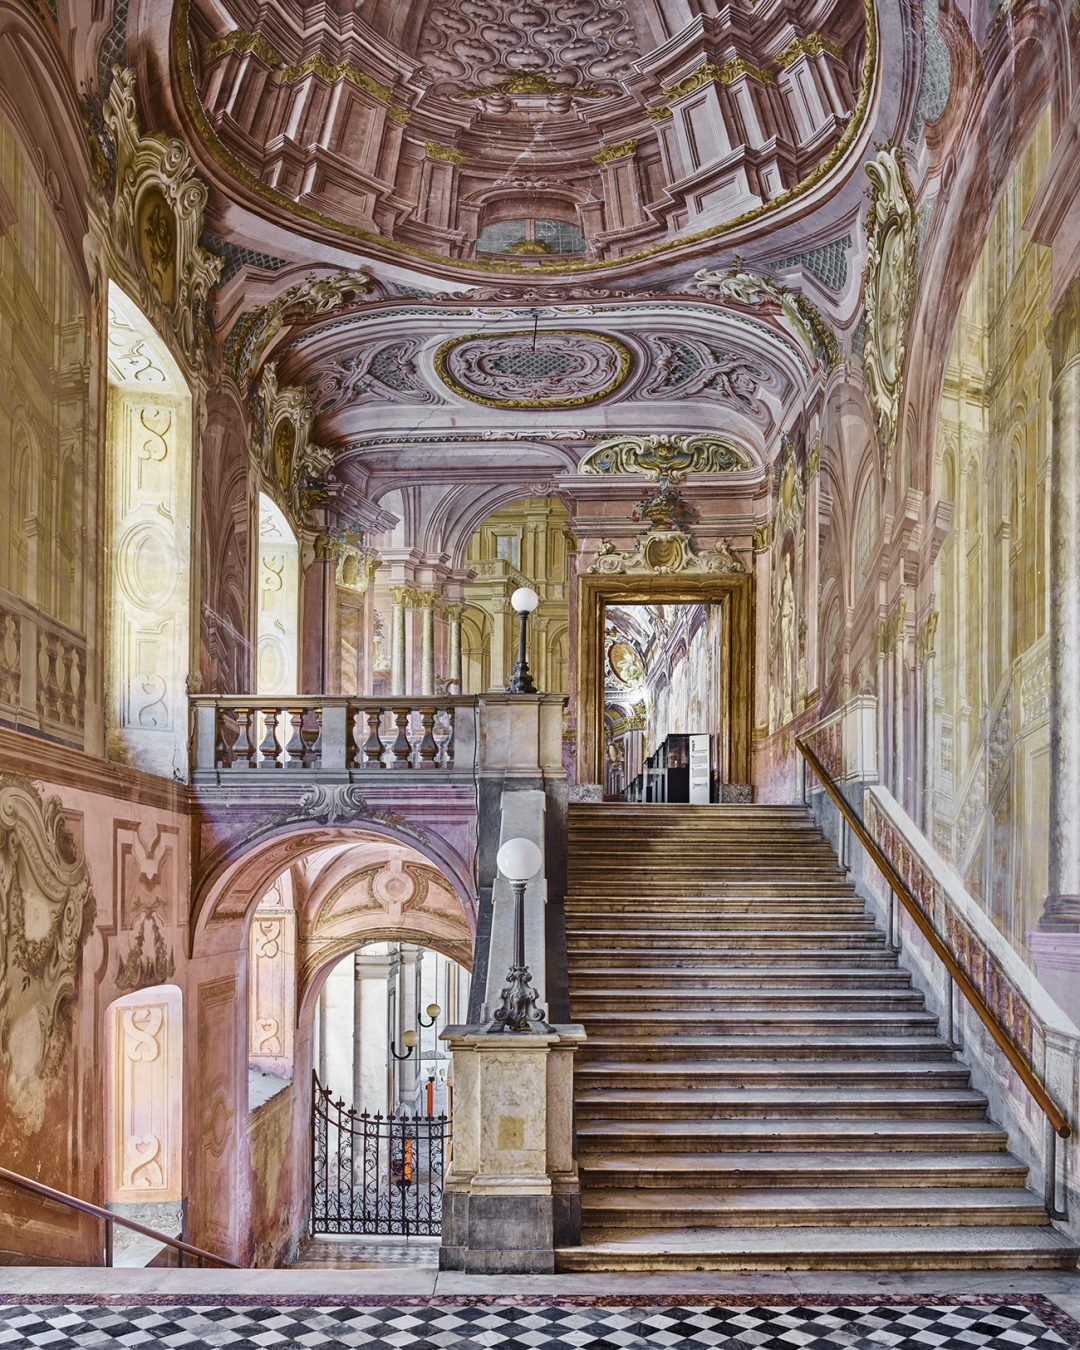 David Burdeny - Trompe-l'œil, Napoli, Italy, 2016